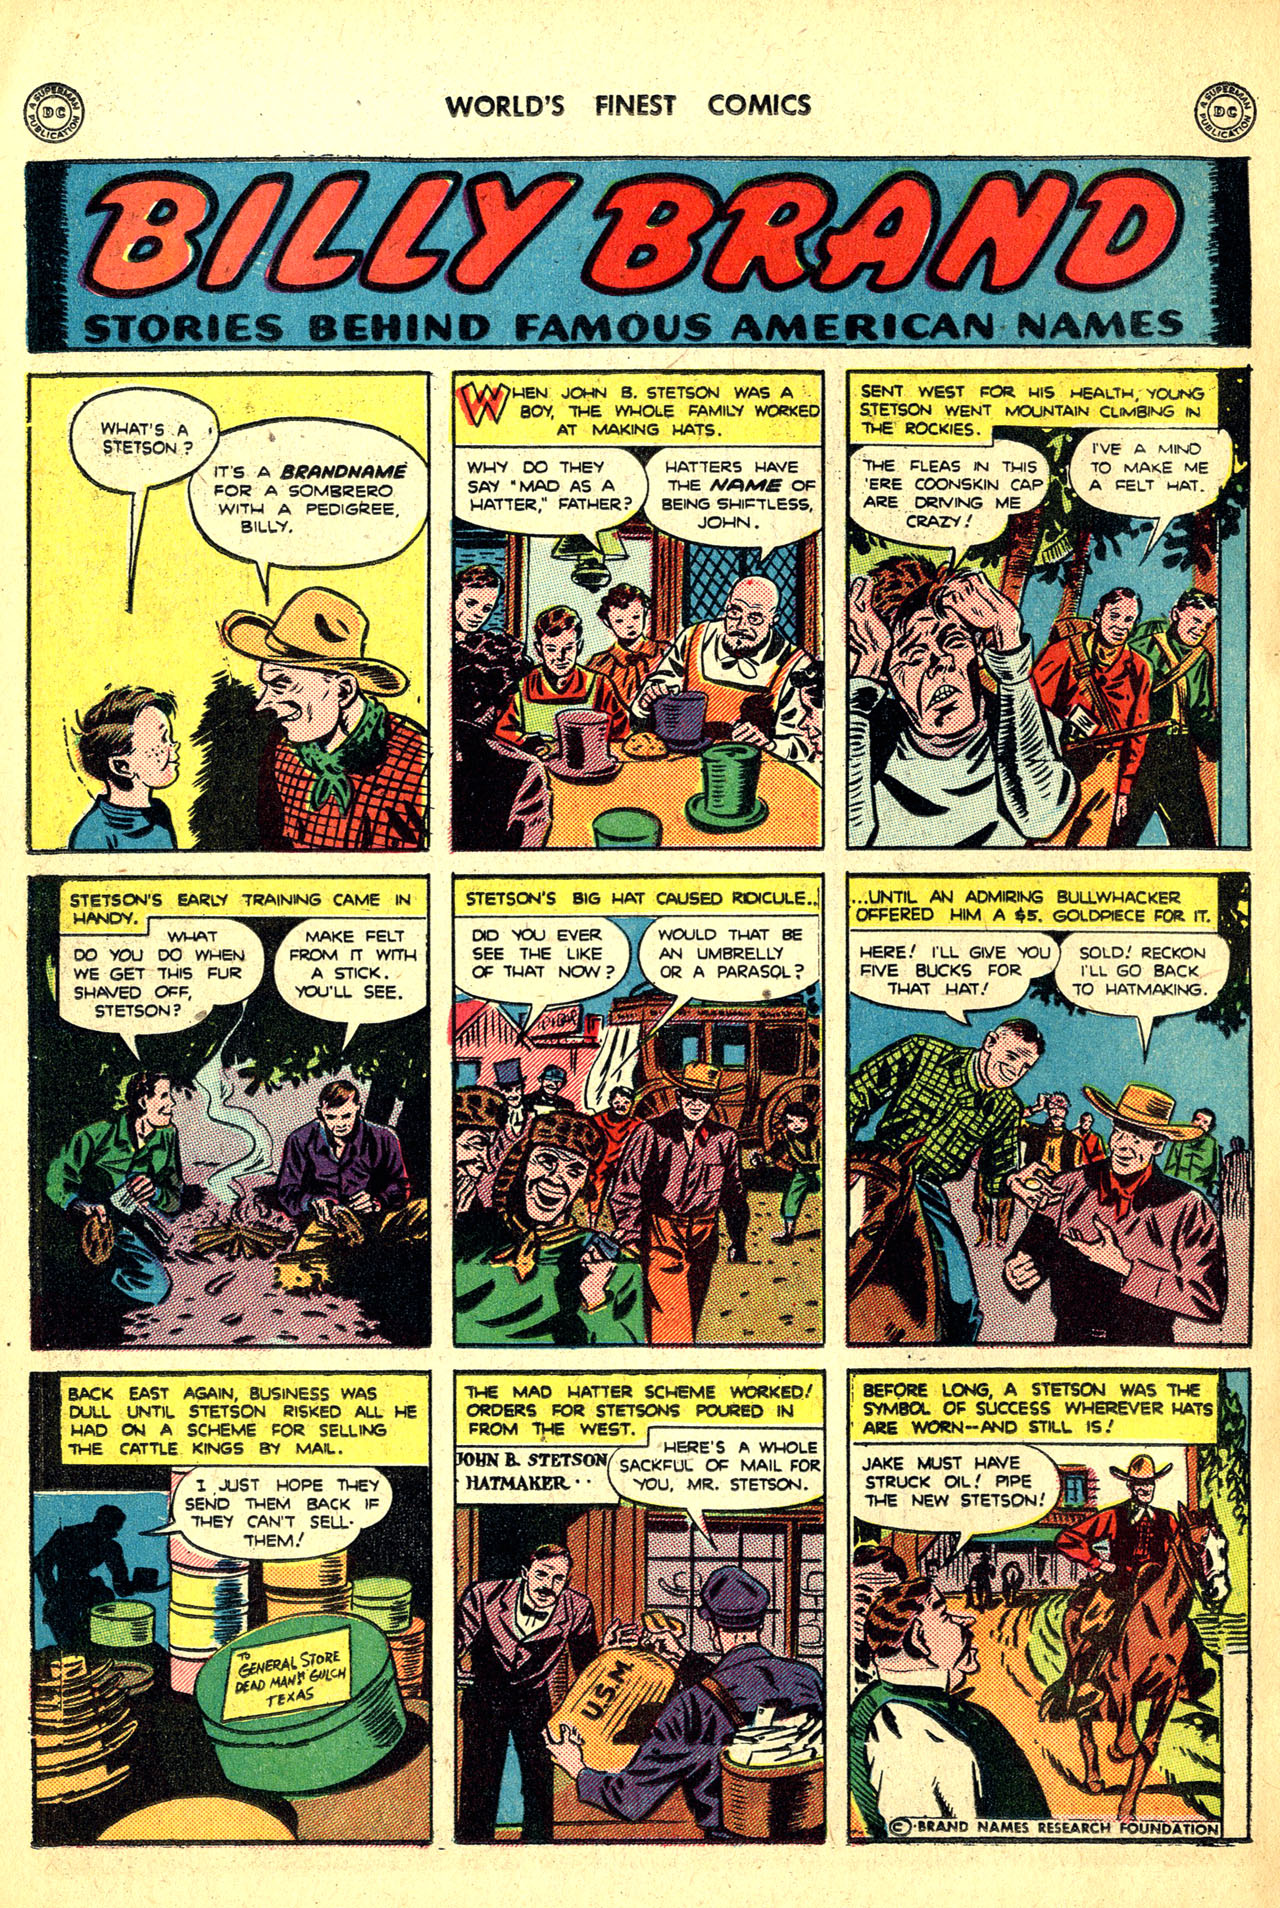 Read online World's Finest Comics comic -  Issue #18 - 68